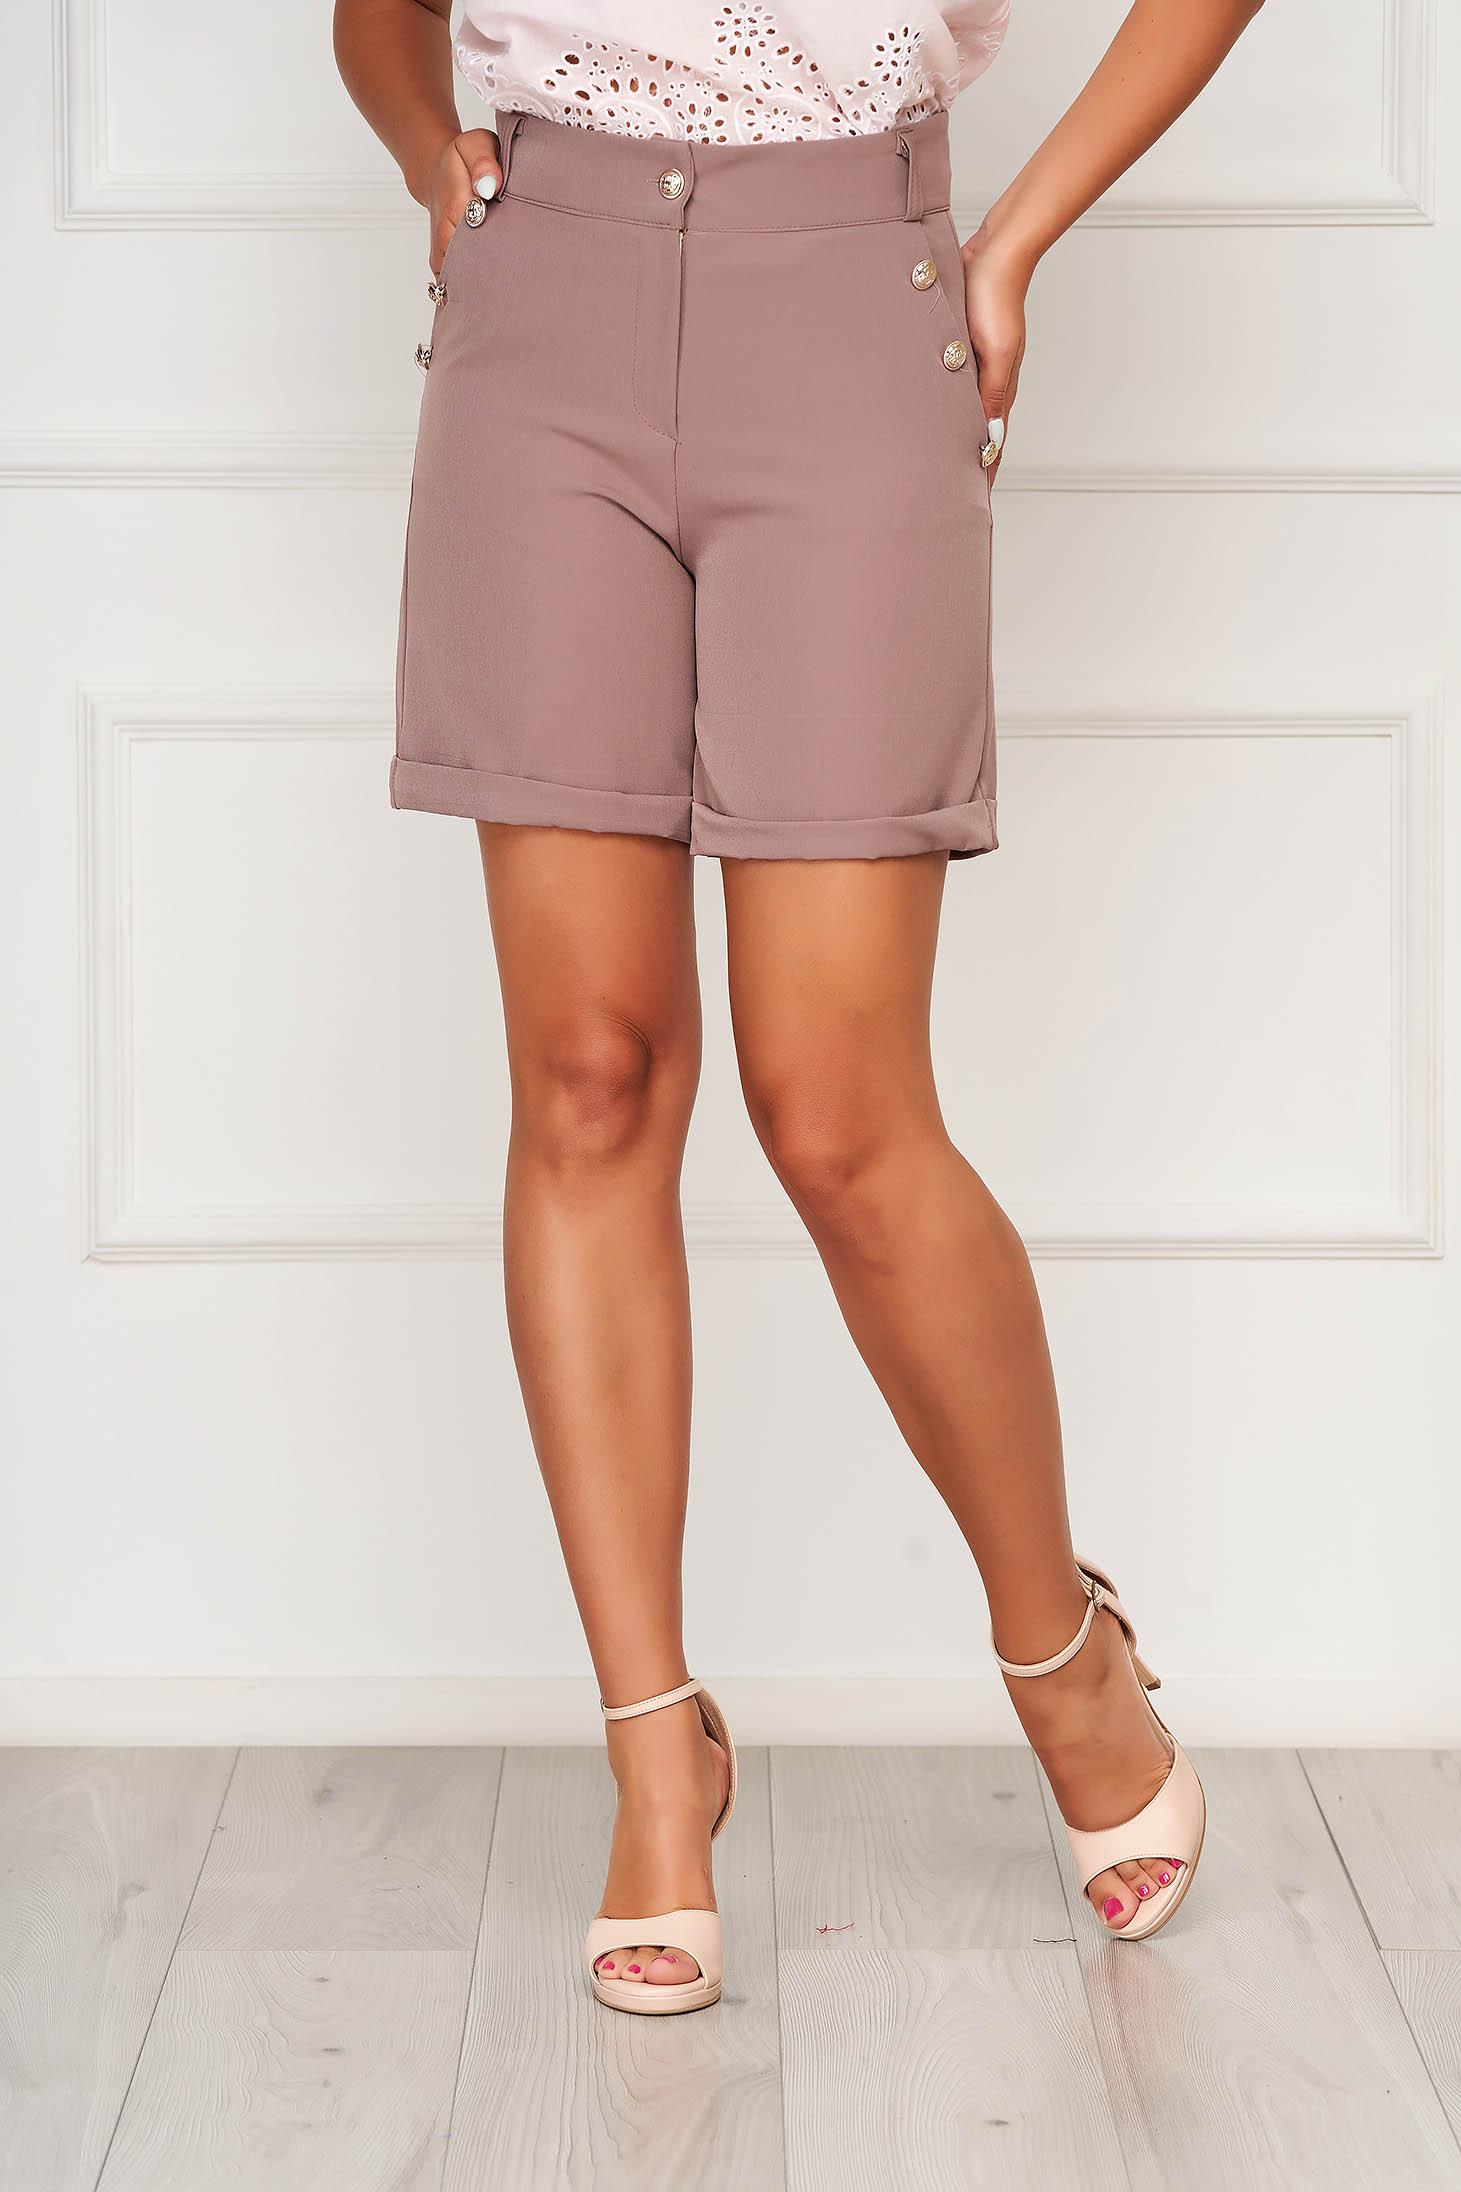 Pantalon scurt SunShine cappuccino casual mulat din stofa elastica cu buzunare